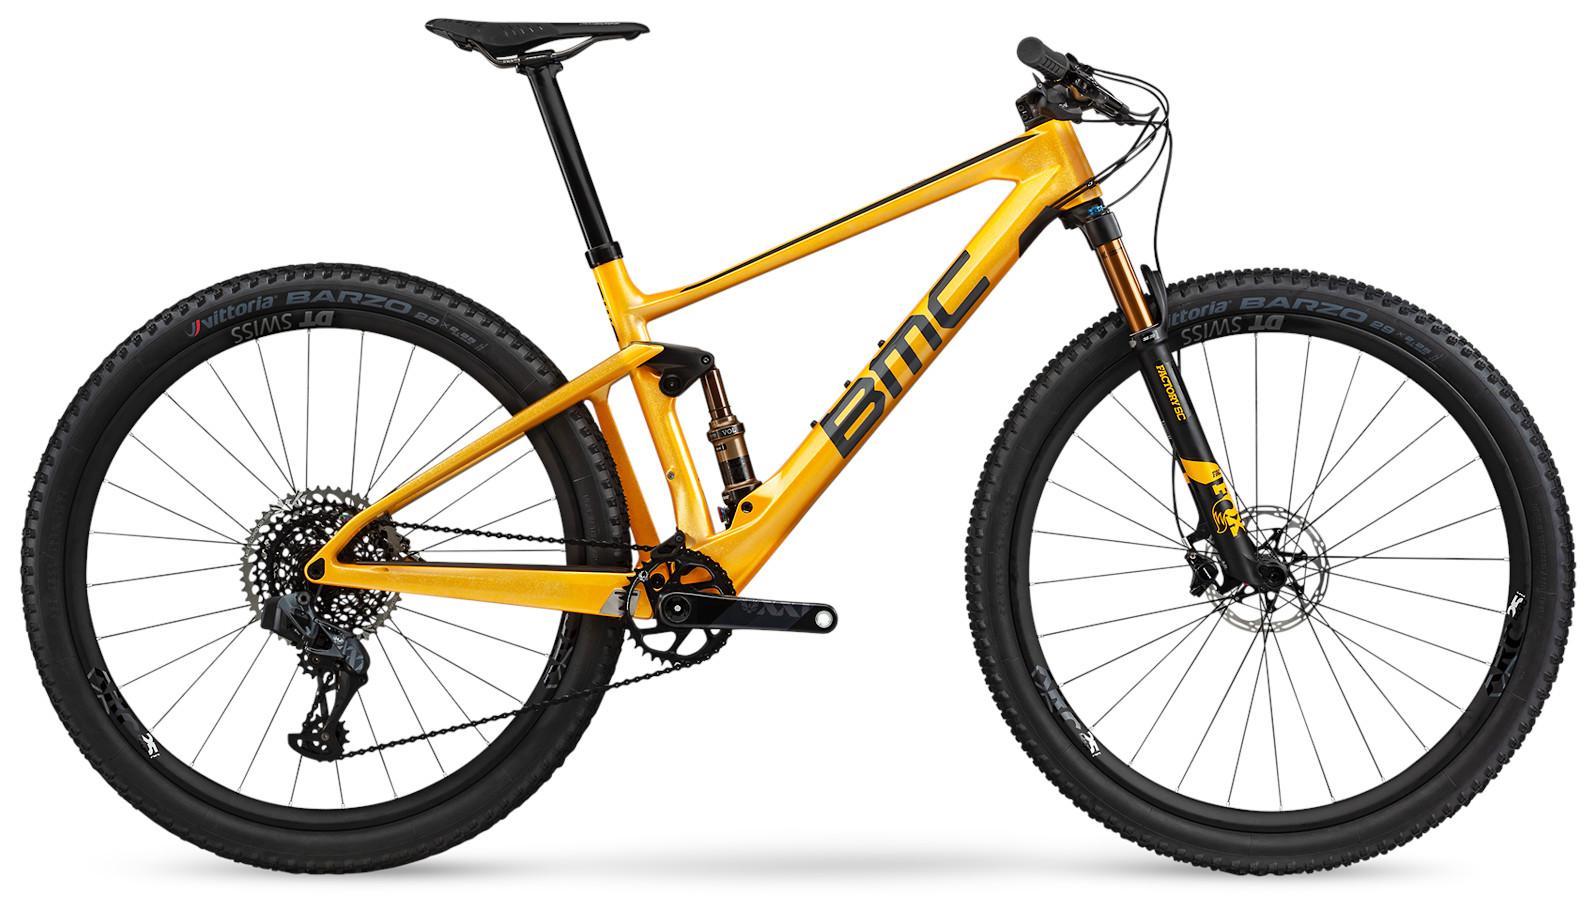 2020 BMC Fourstroke 01 One